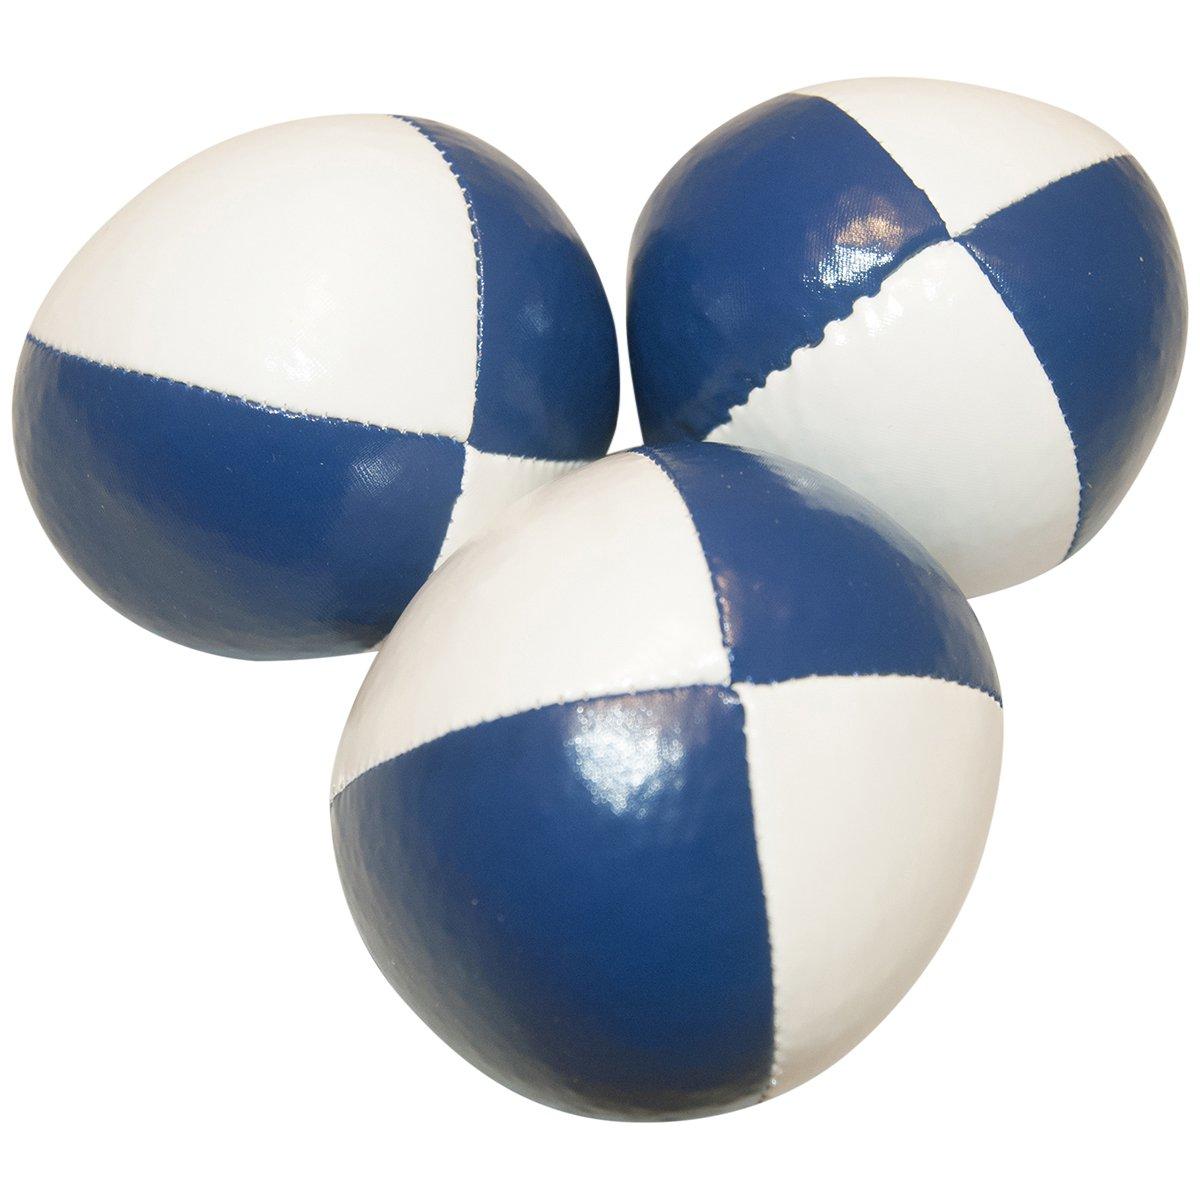 Juggling Balls Set of 3 Professional Style (white/blue)